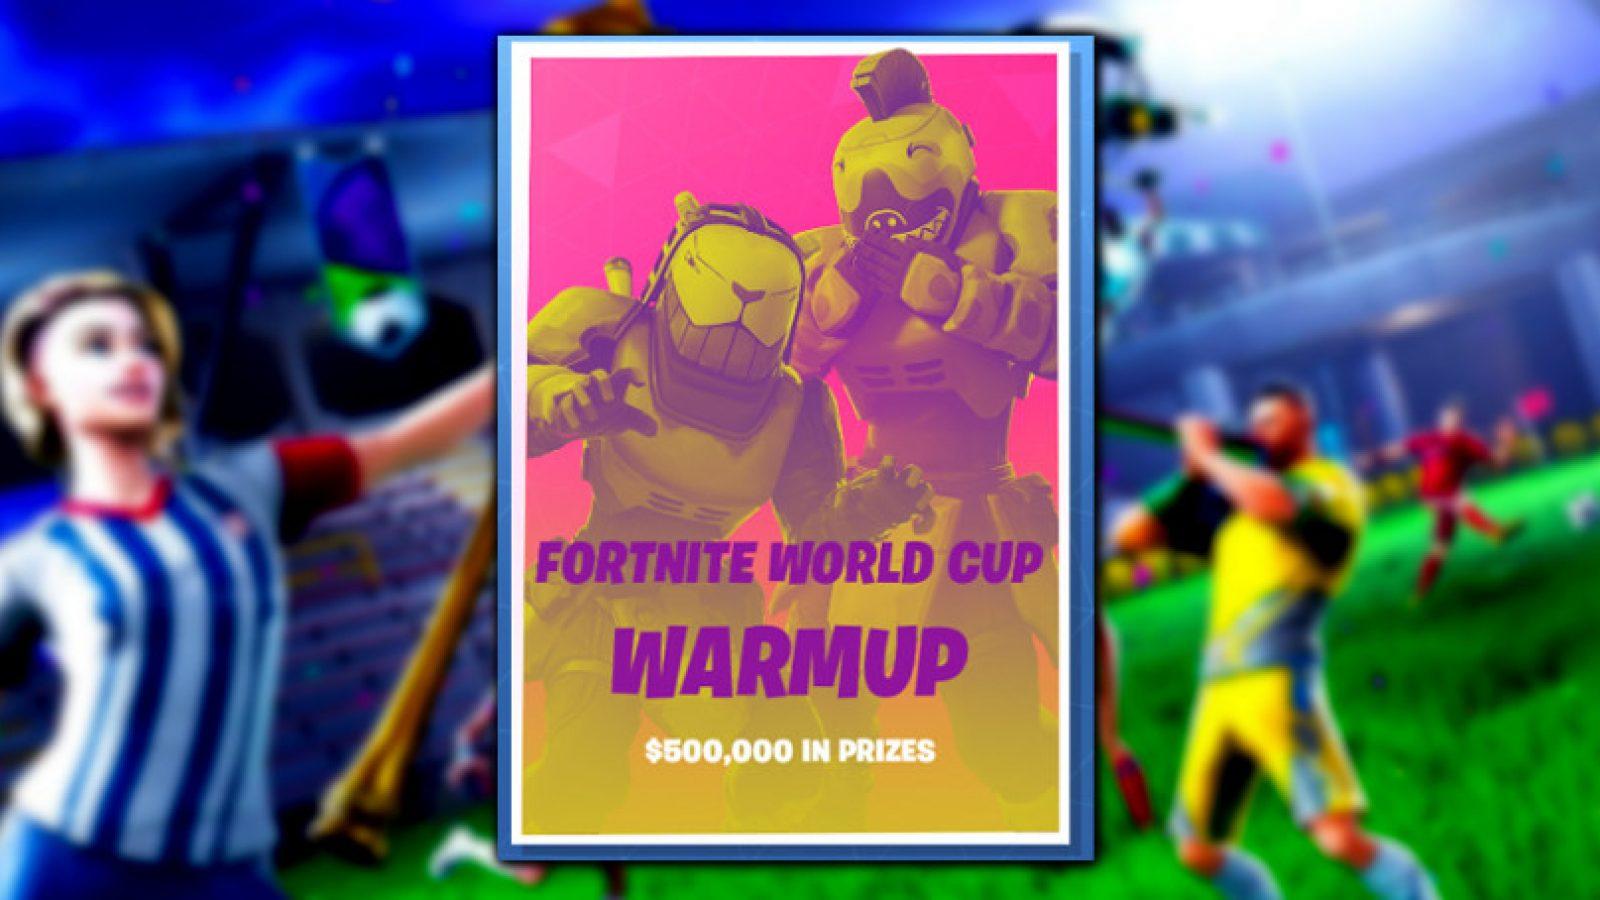 49 Fortnite 2019 World Cup Wallpapers On Wallpapersafari